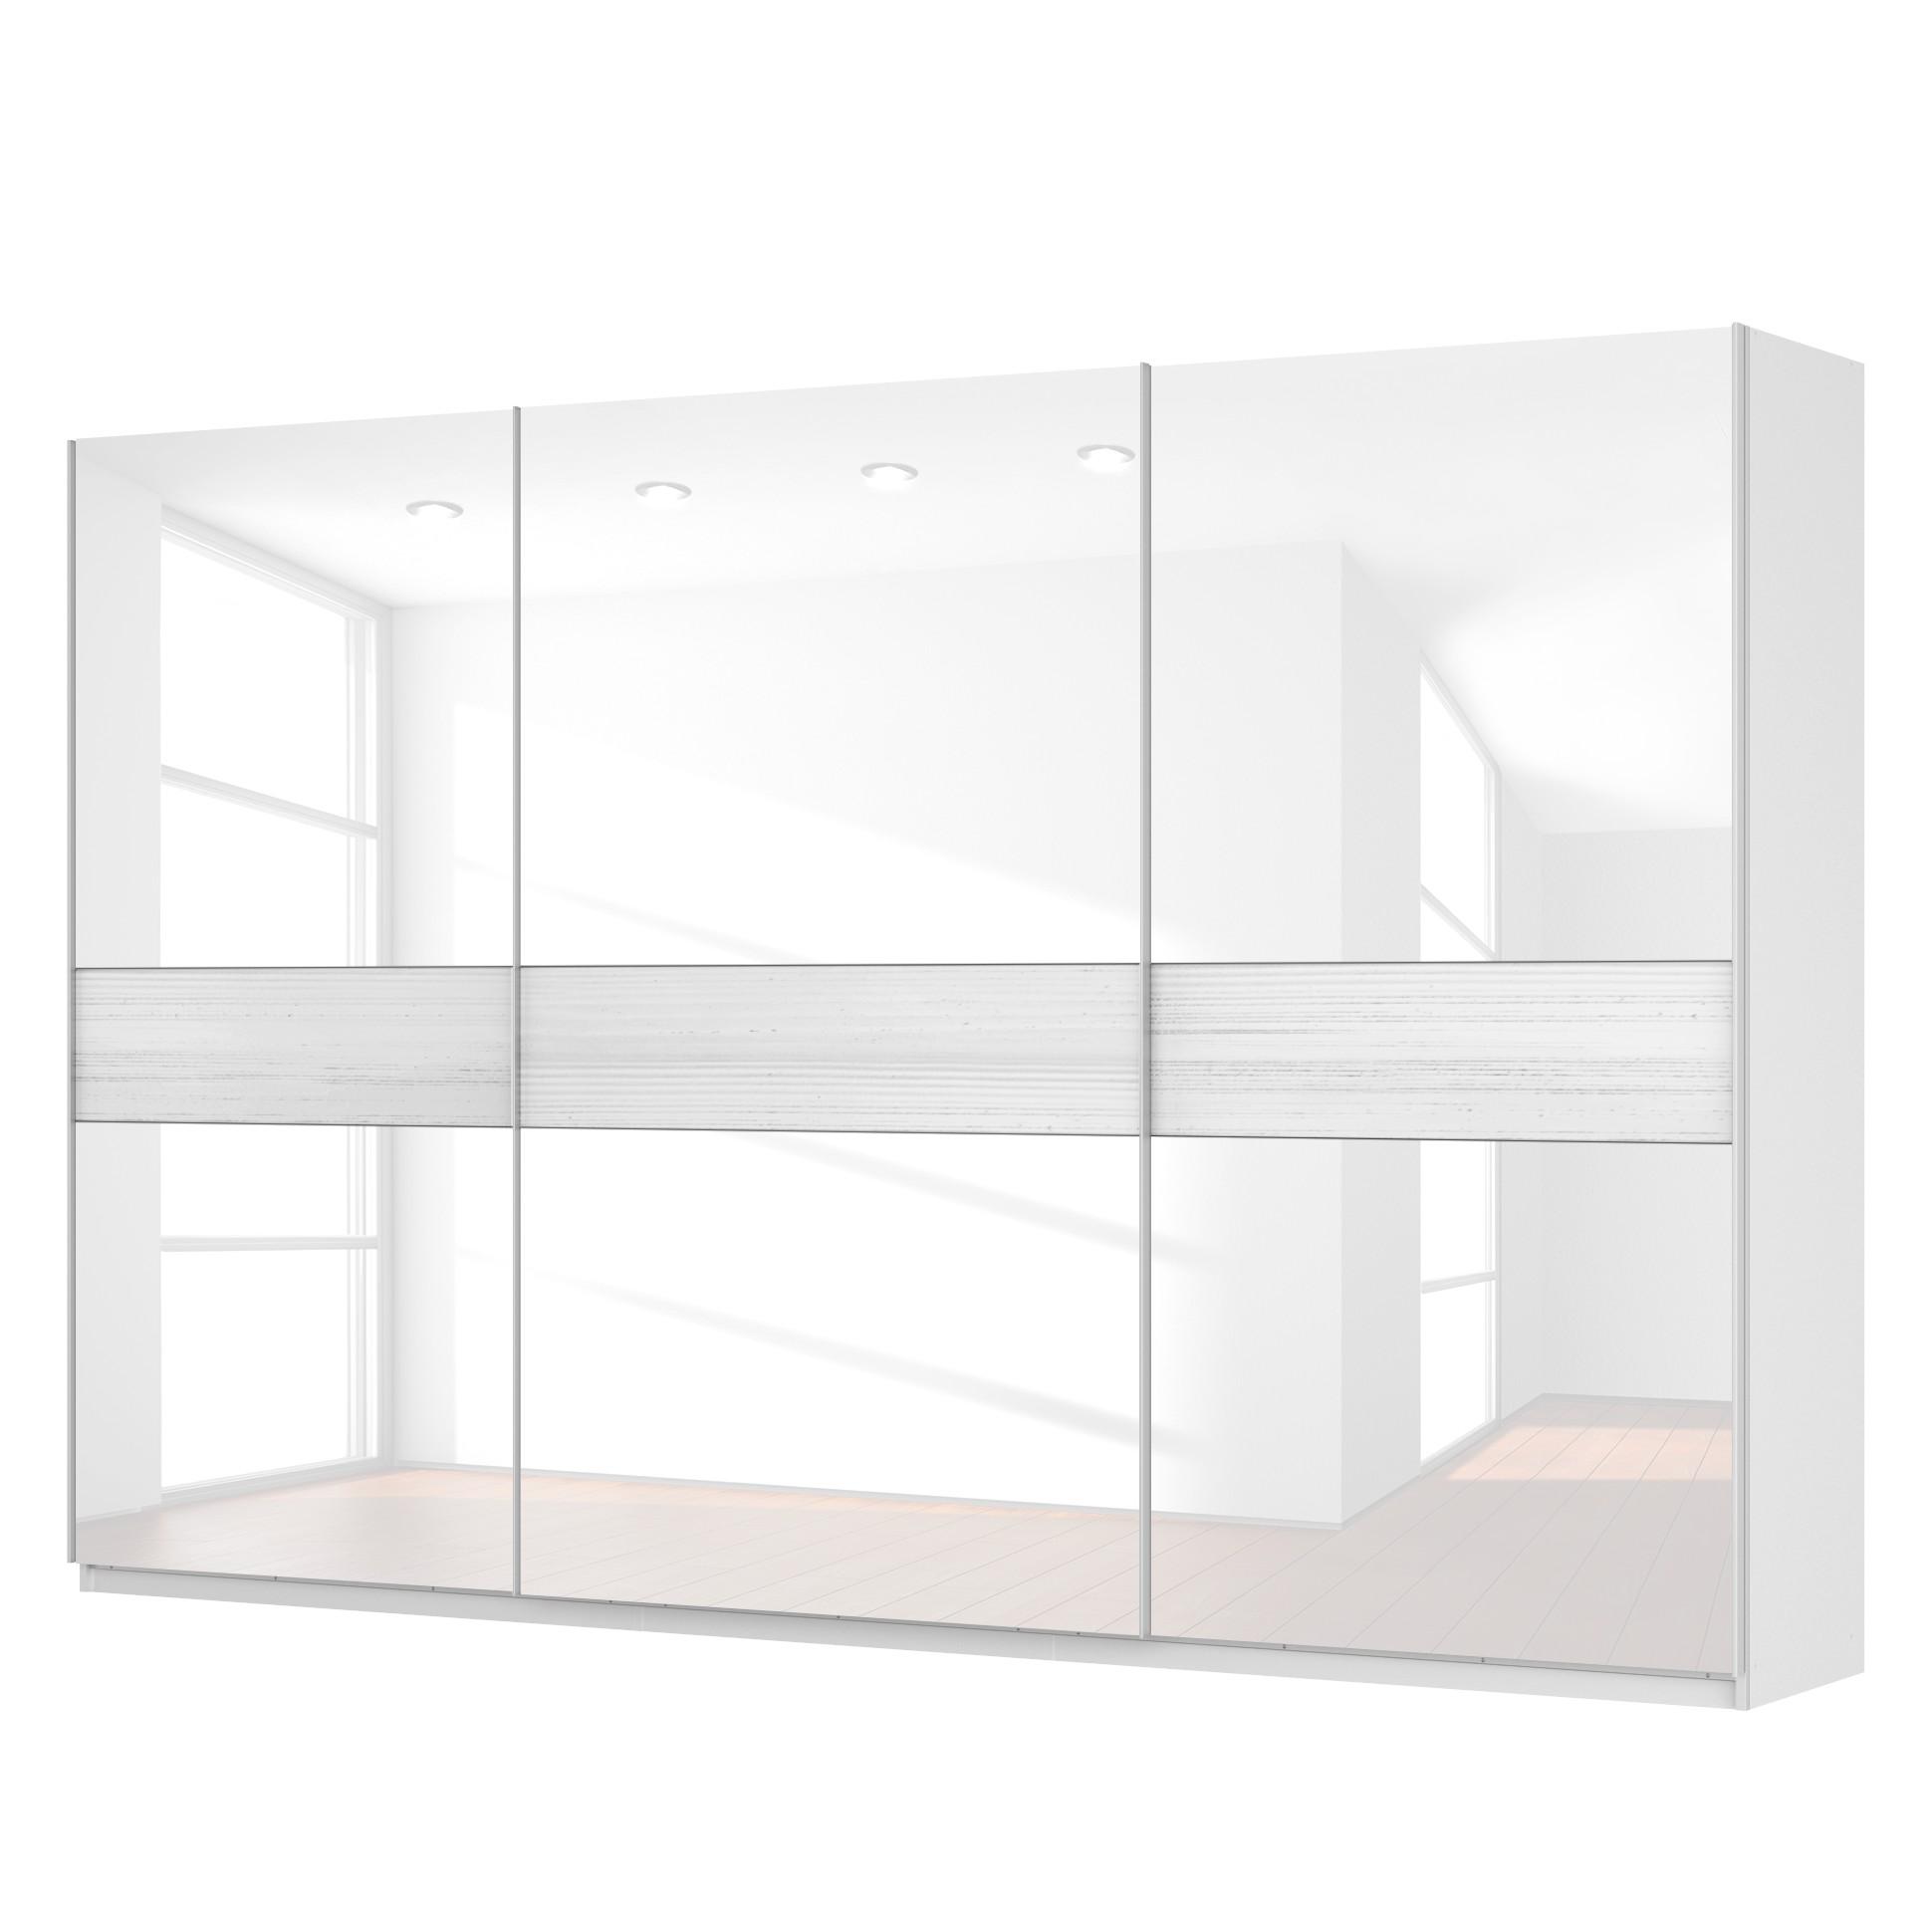 schwebet renschrank sk p alpinwei glas wei 360 cm 3 t rig 236 cm premium sk p. Black Bedroom Furniture Sets. Home Design Ideas